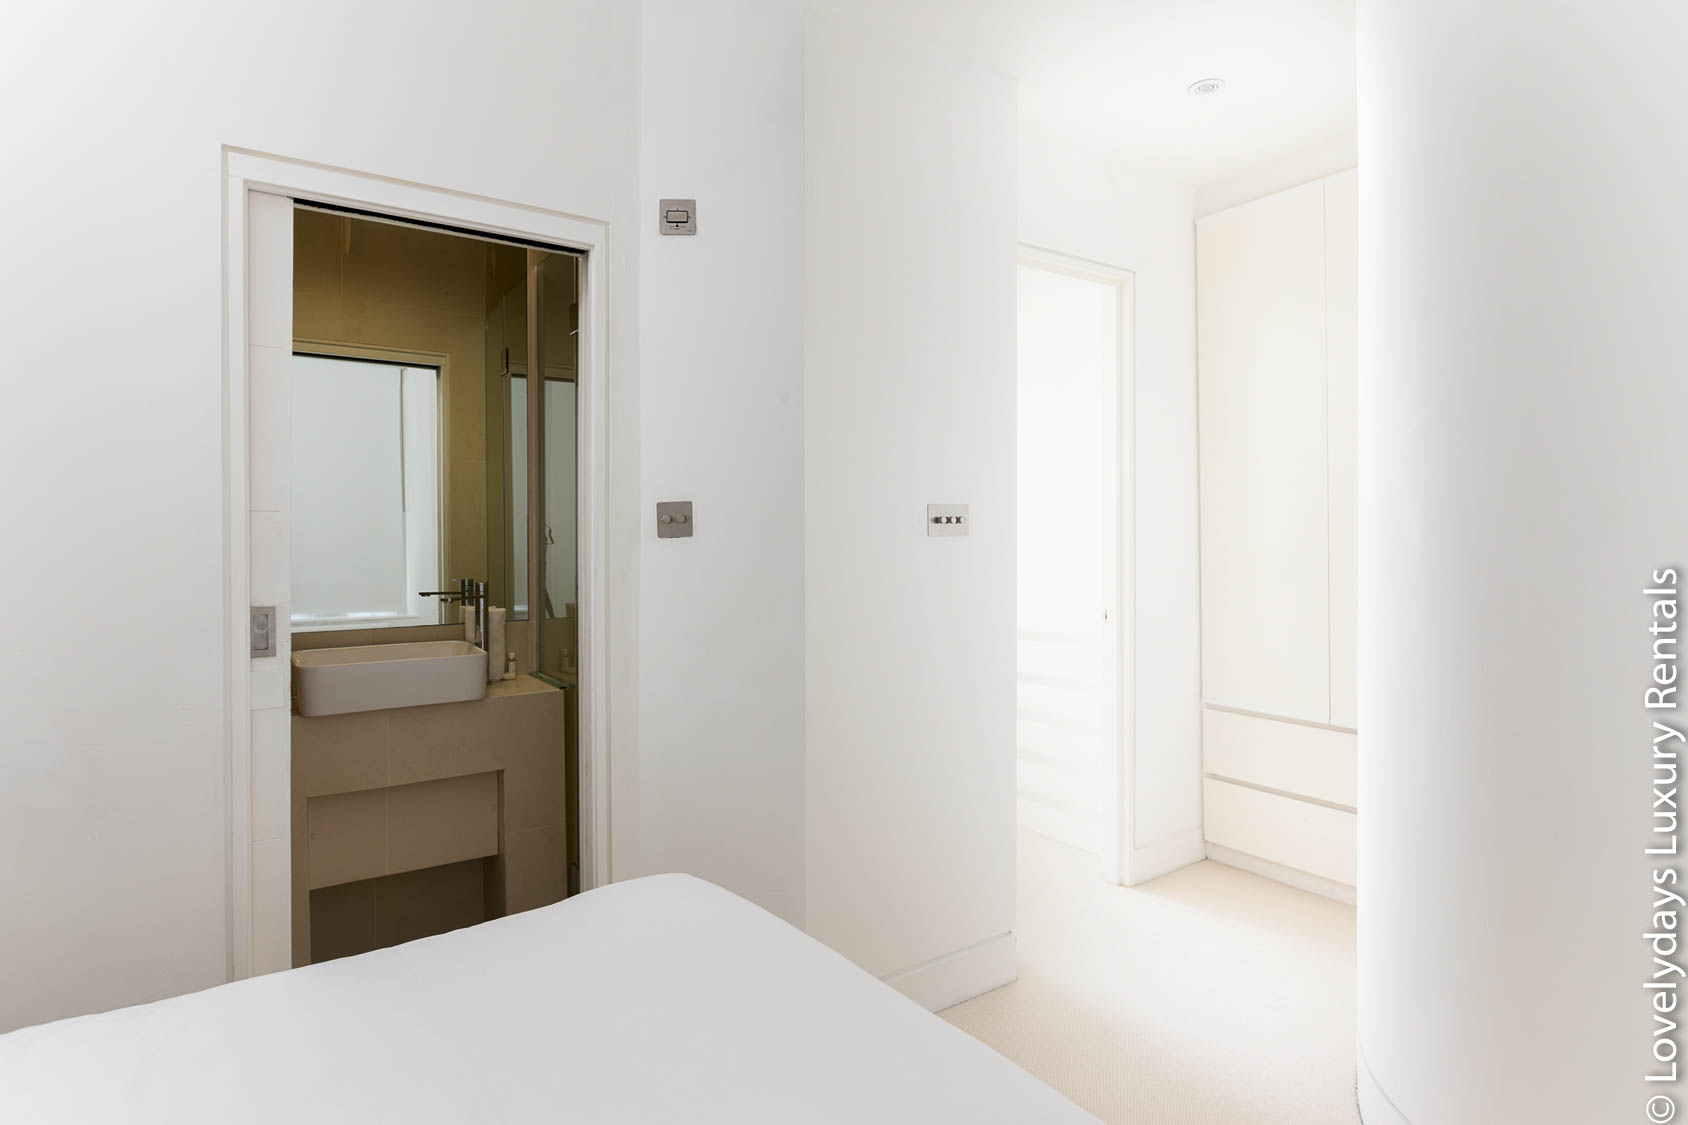 Lovelydays luxury service apartment rental - London - Fitzrovia - Foley Street - Lovelysuite - 2 bedrooms - 2 bathrooms - Double bed - c39f3638229c - Lovelydays